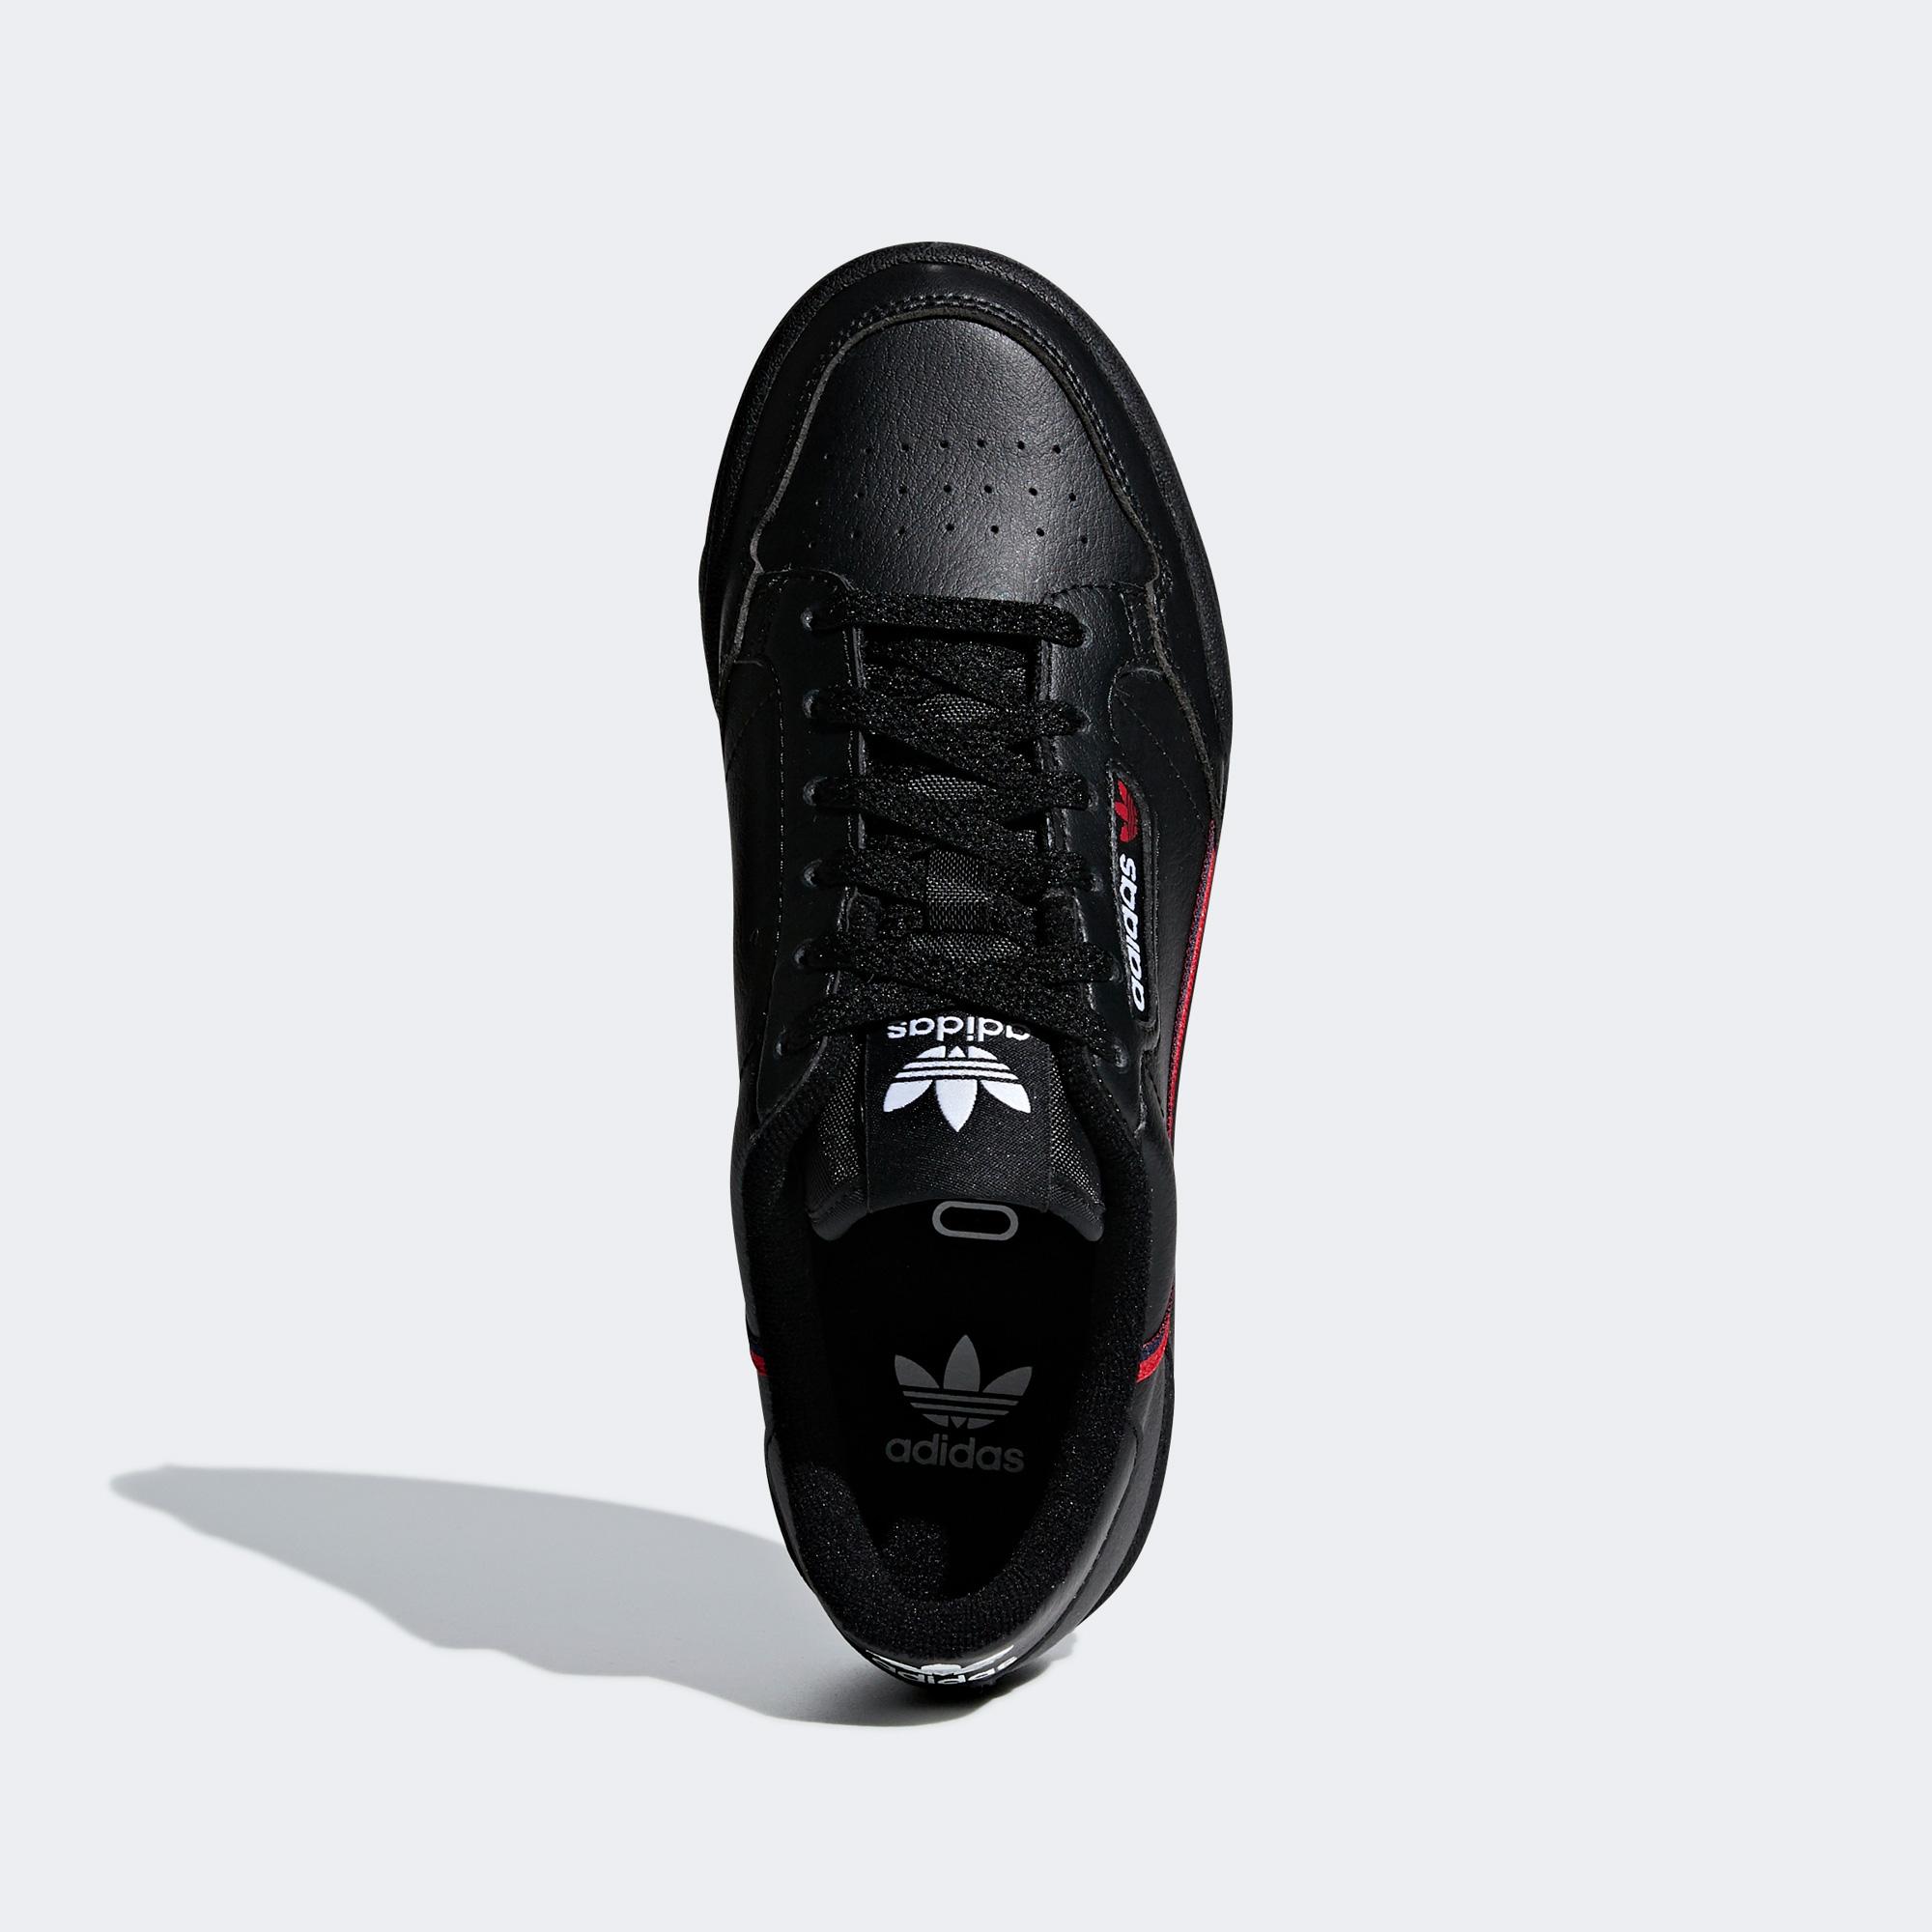 adidas Continental 80 Kadın Siyah Spor Ayakkabı